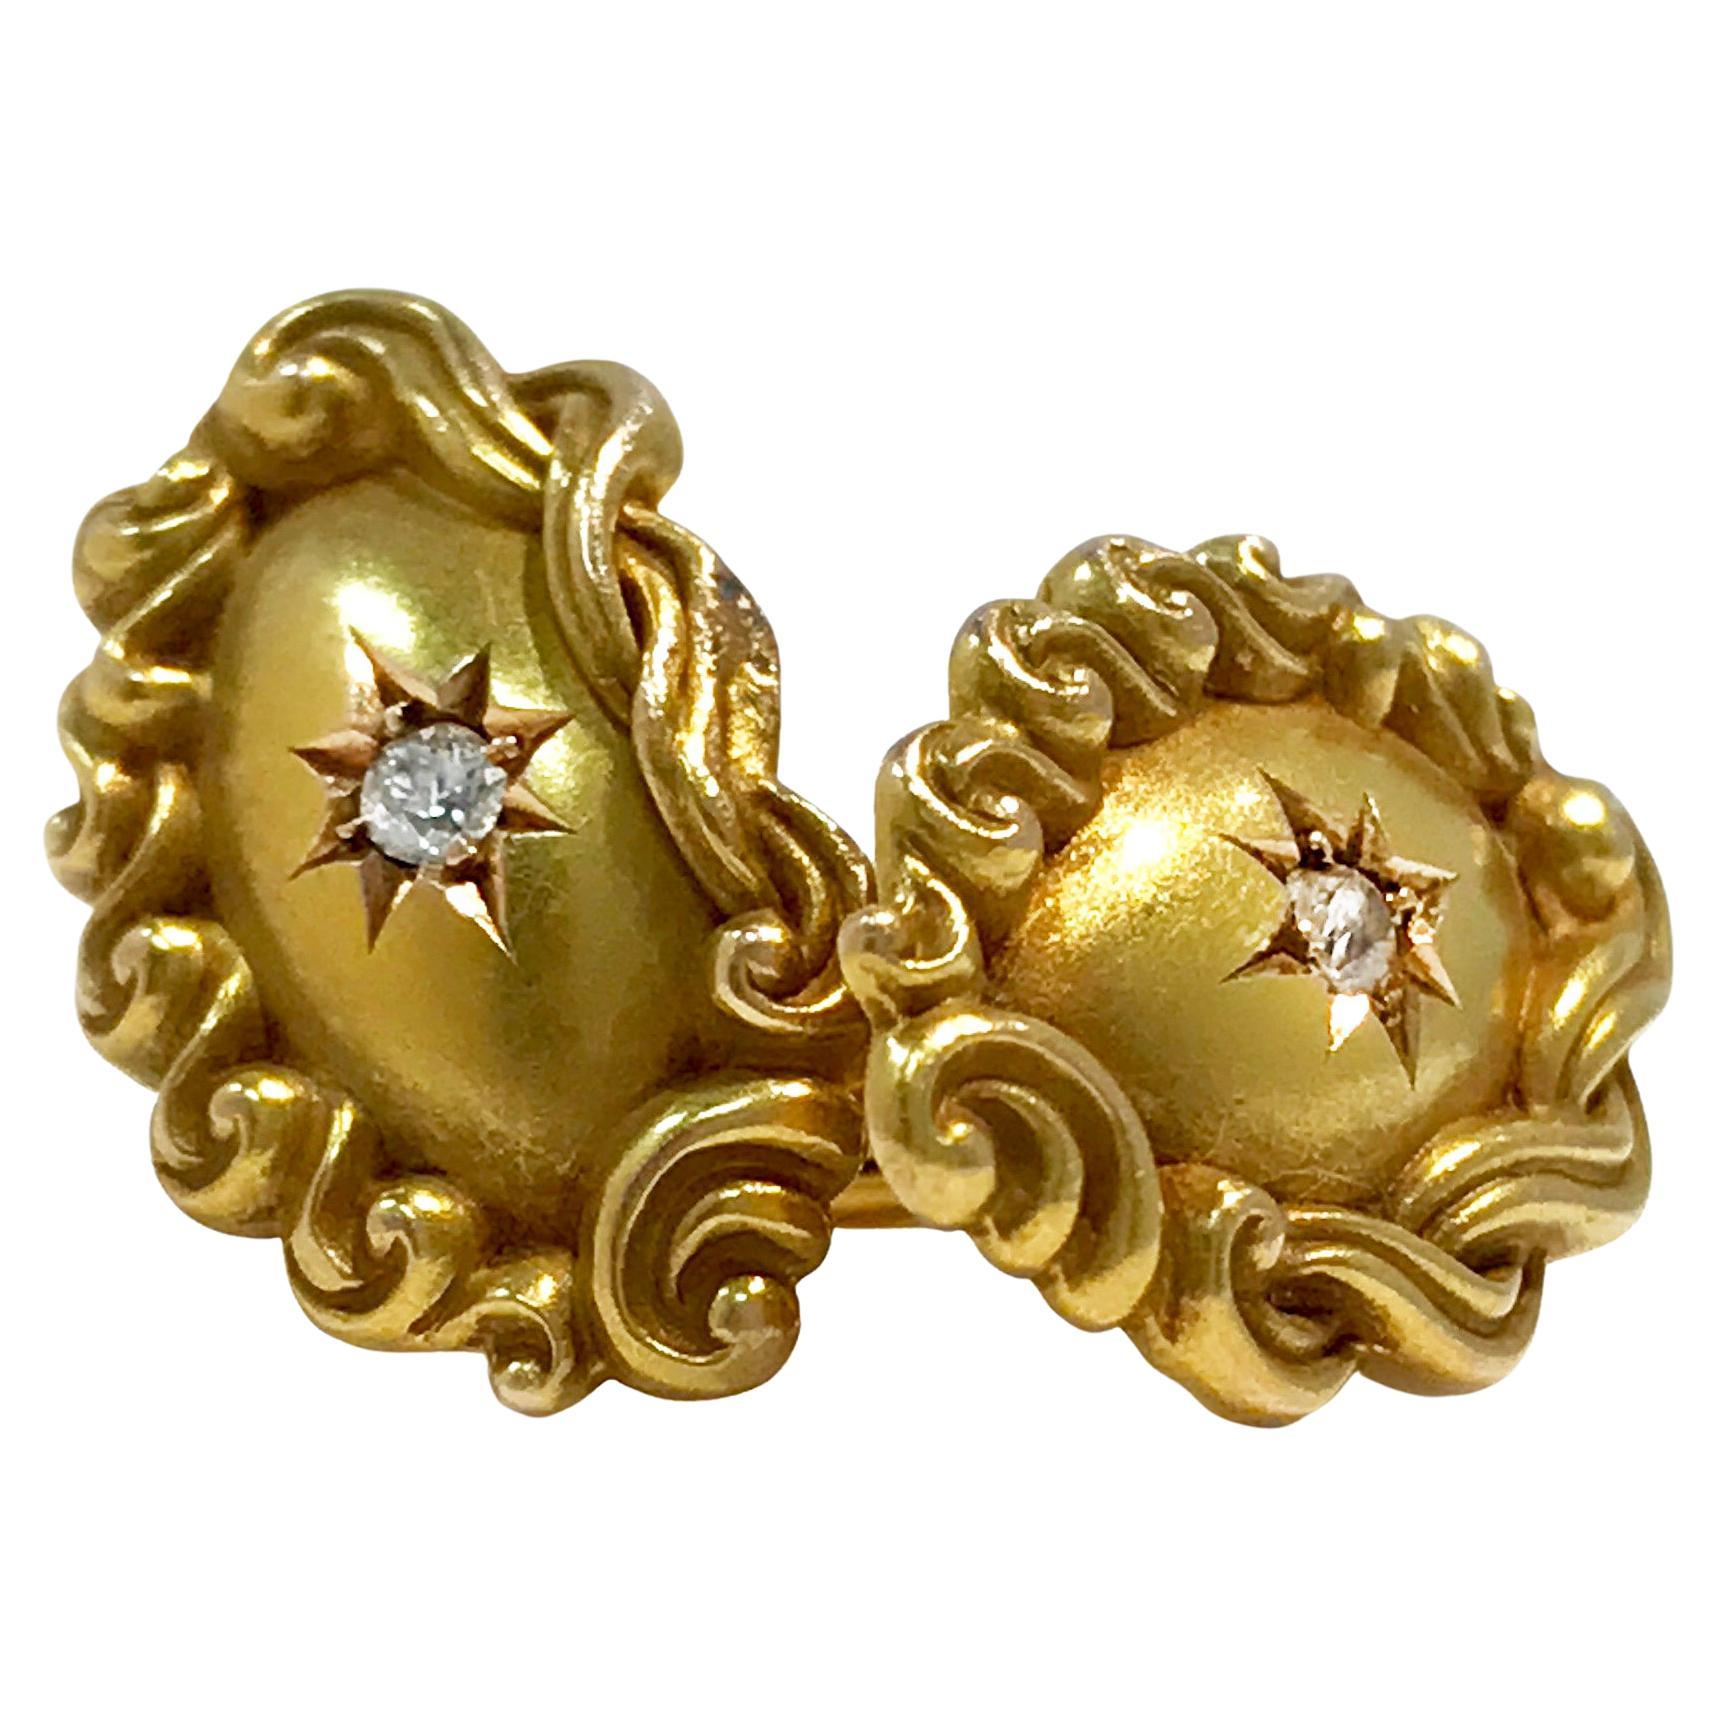 Victorian Gold Oval Cufflinks, Star Set Diamond Center 0.06 Carat